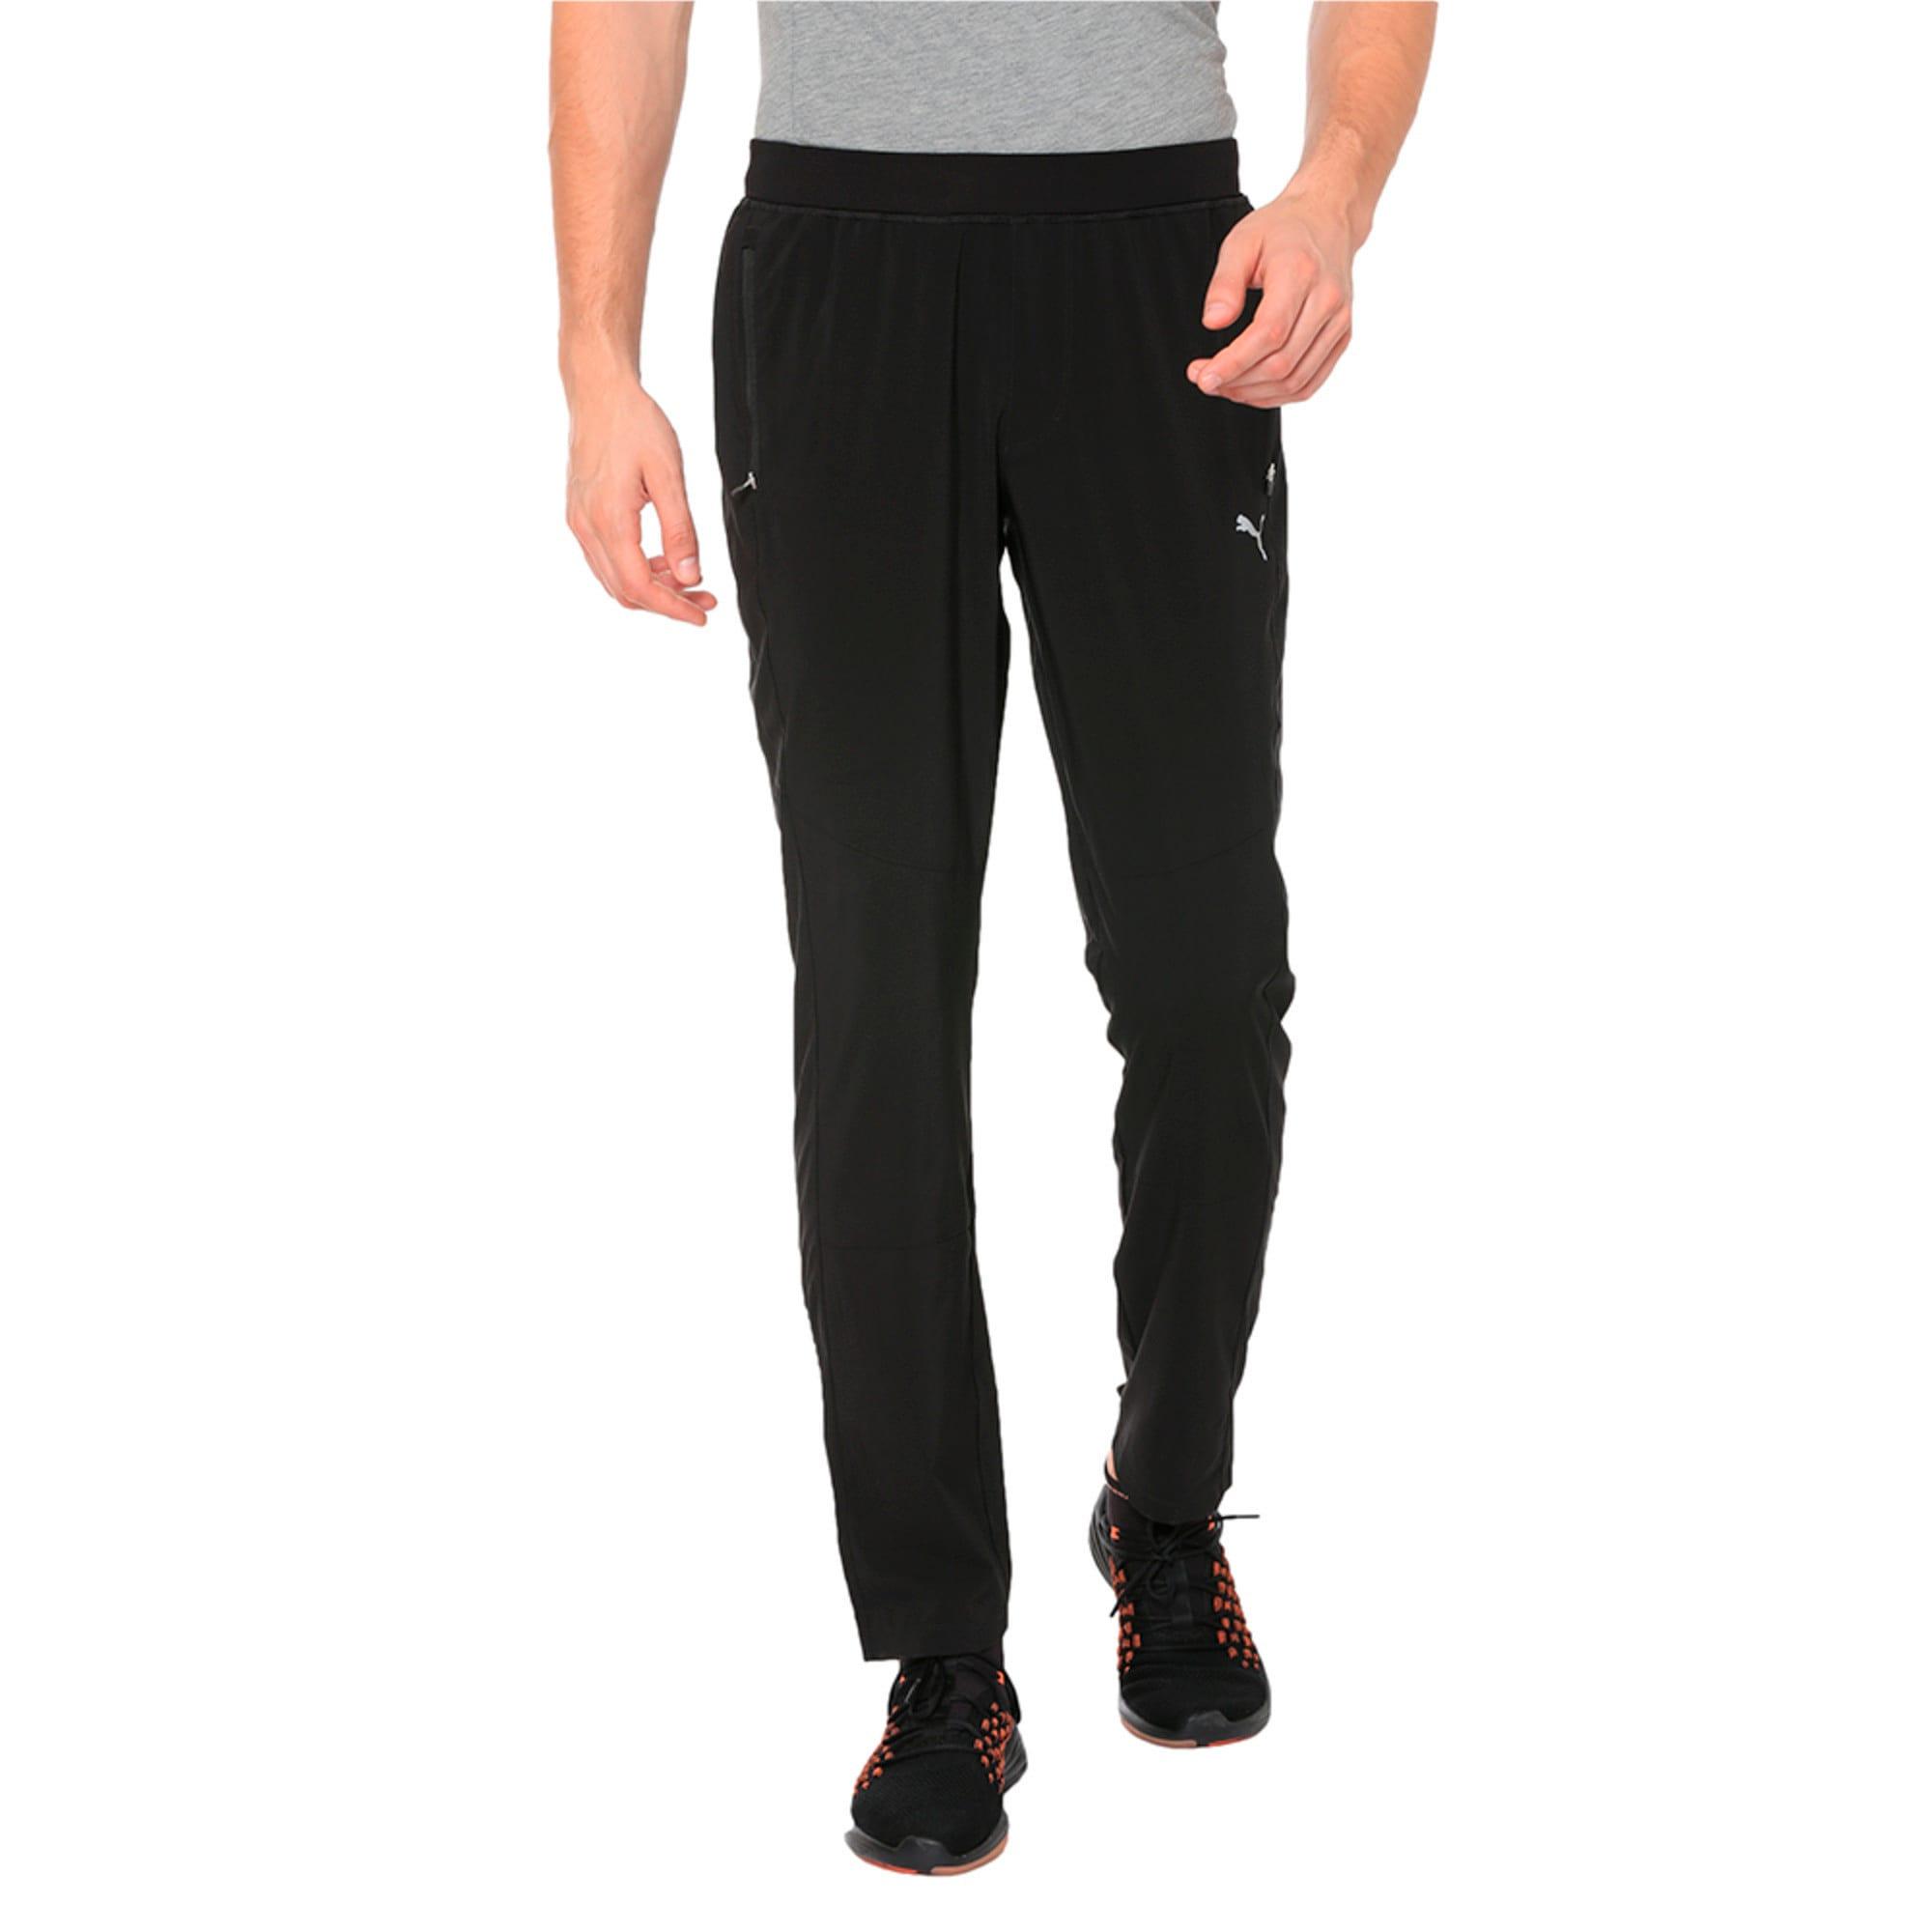 Thumbnail 1 of Tapered Woven Men's Running Pants, Puma Black, medium-IND